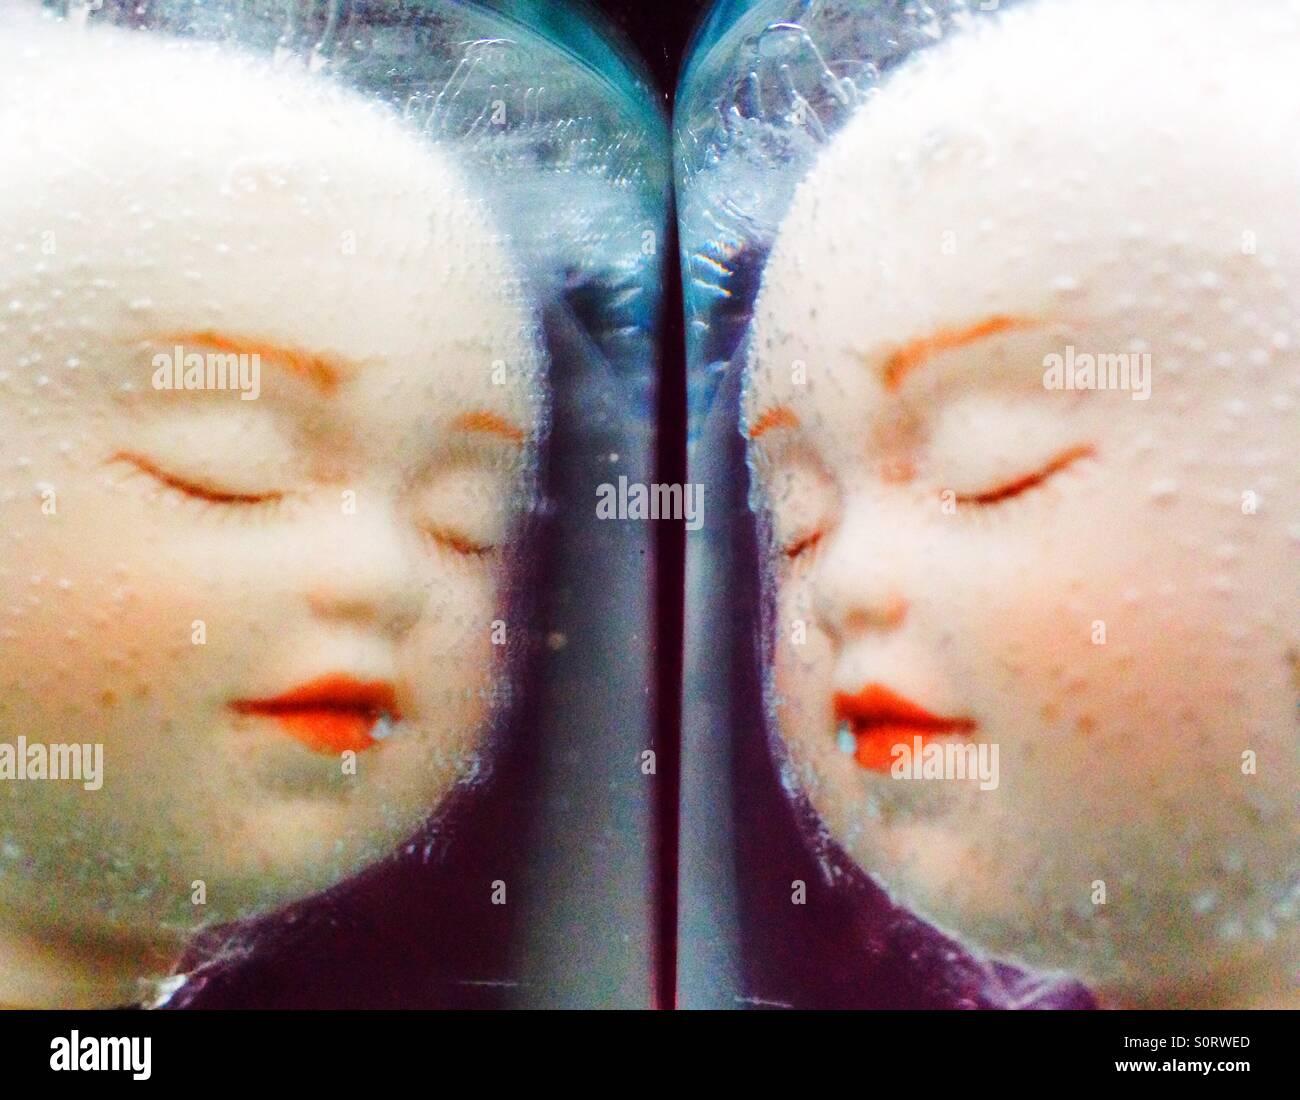 Una imagen de espejo de la muñeca se enfrenta. Imagen De Stock